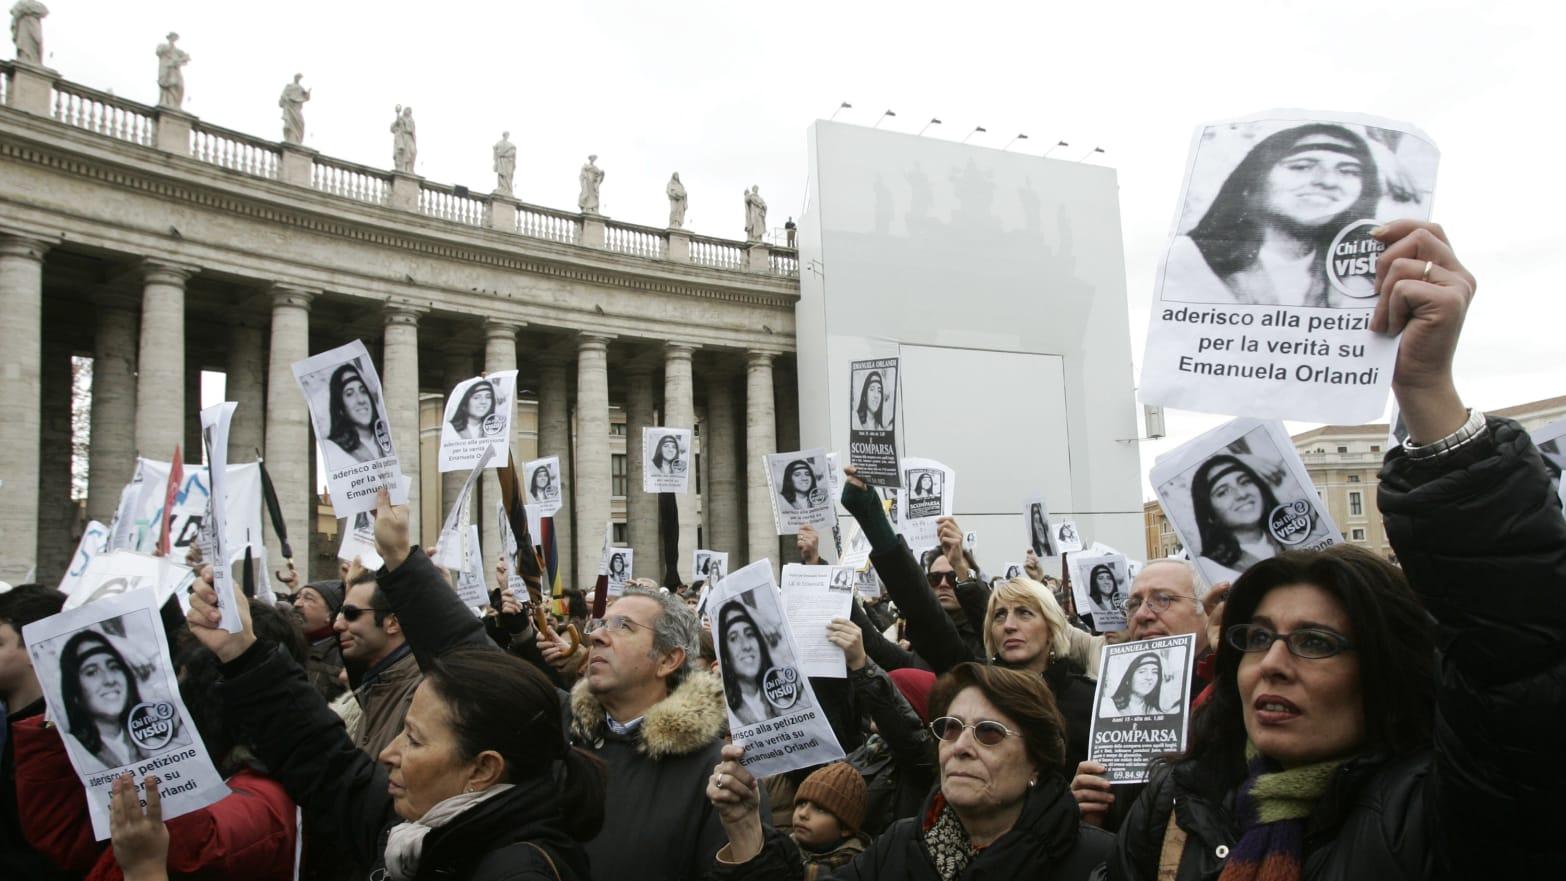 Is Missing Teen Emanuela Orlandi a Vatican Sex Slave? 190306-barbie-vatican-tease_lk81co